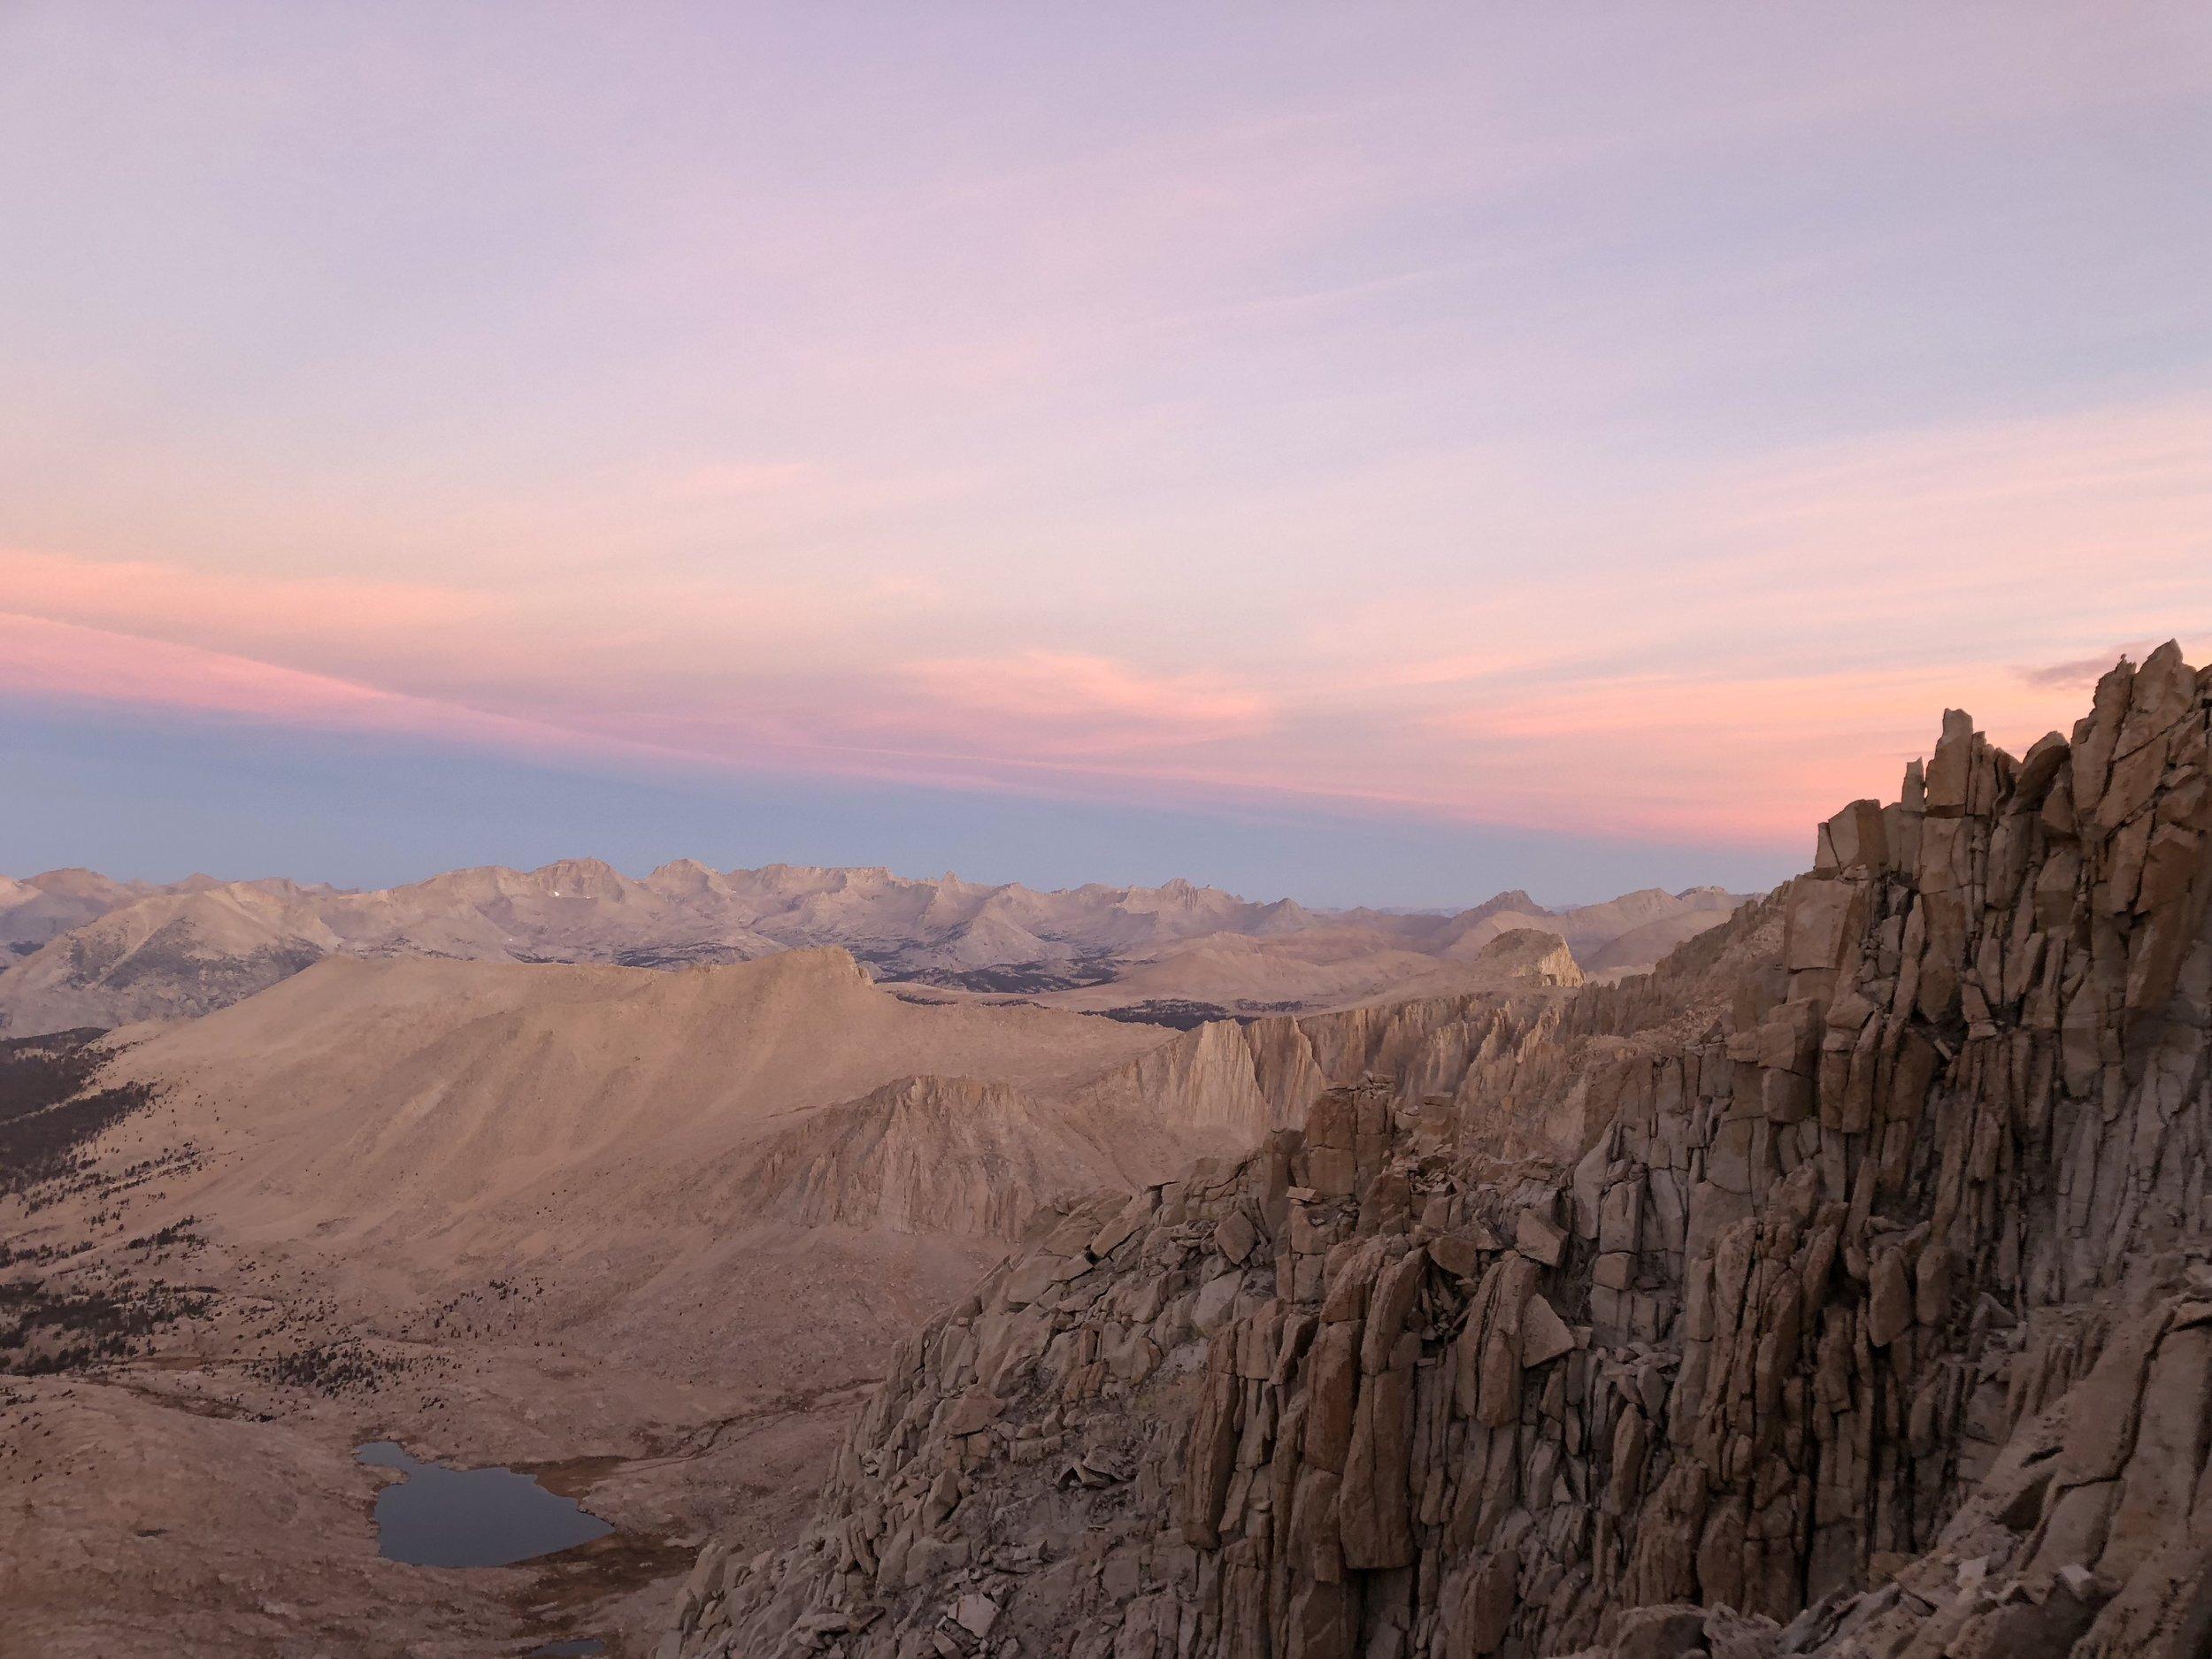 Sunrise on the way to Mt. Whitney